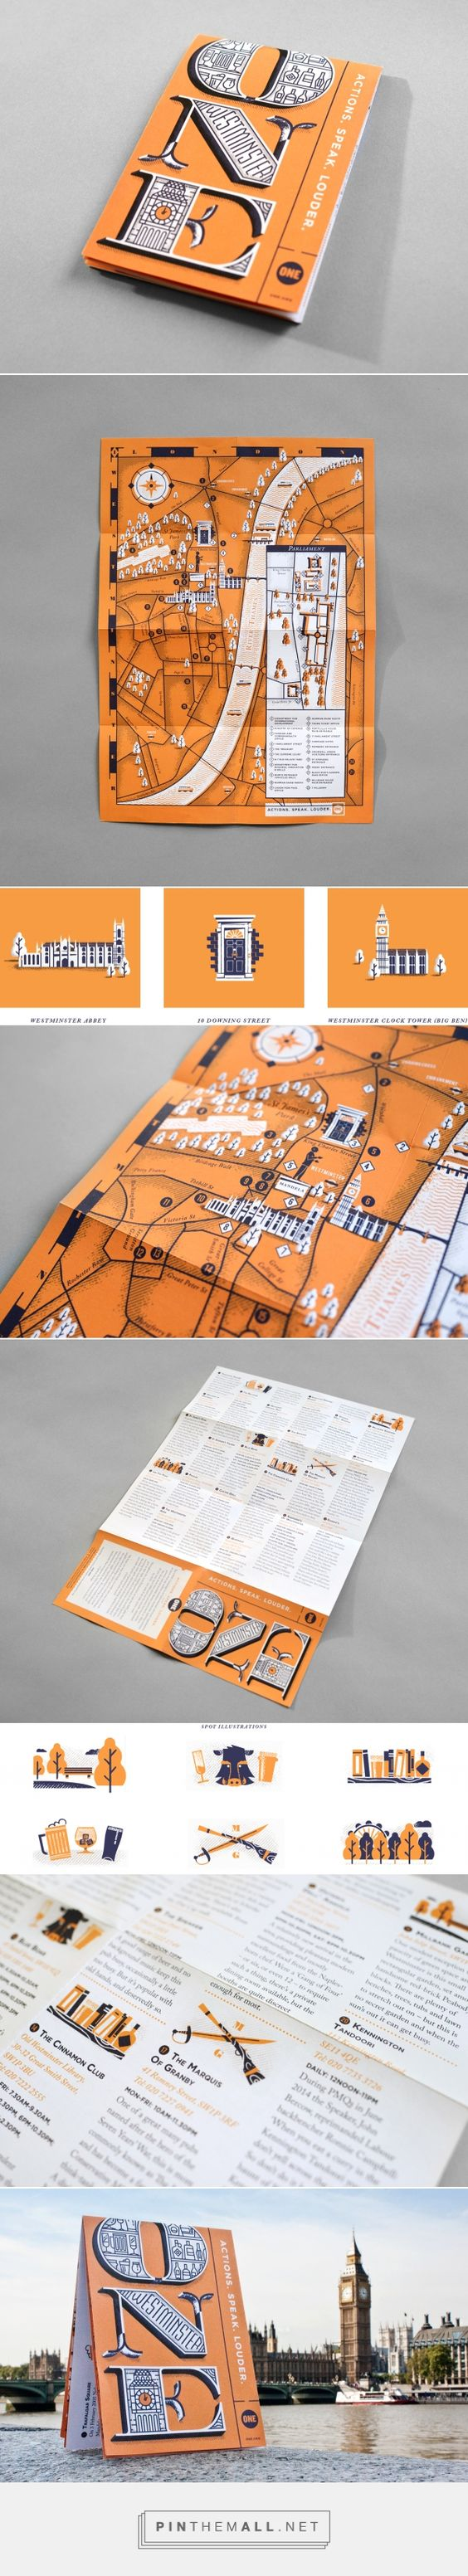 ONE Westminster - Map - Herb Lester Associates on Behance - created via http://pinthemall.net